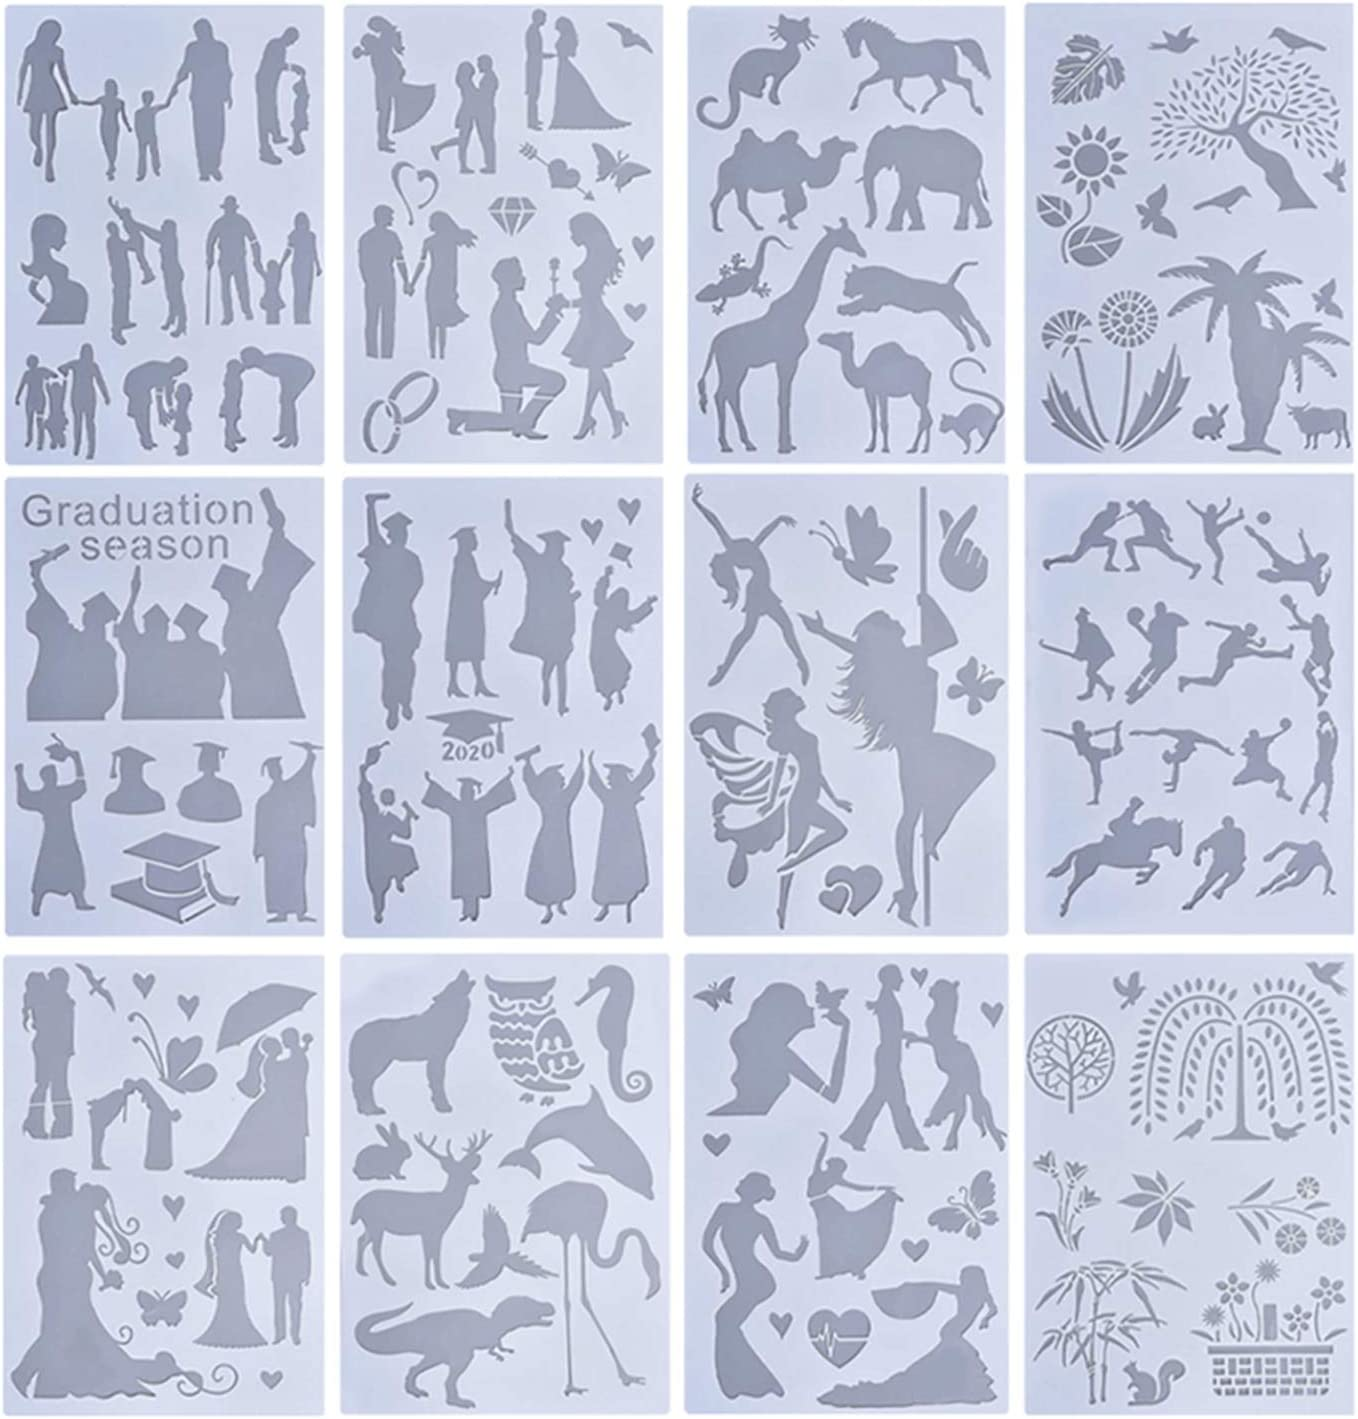 37YIMU 12Pcs Reusable Mix Style Painting Scrapbook Painting Stencils, A4 Size Stencil Painting Template Floor Wall Tile Fabric Furniture Template DIY Embossing Album Tool Home Decor